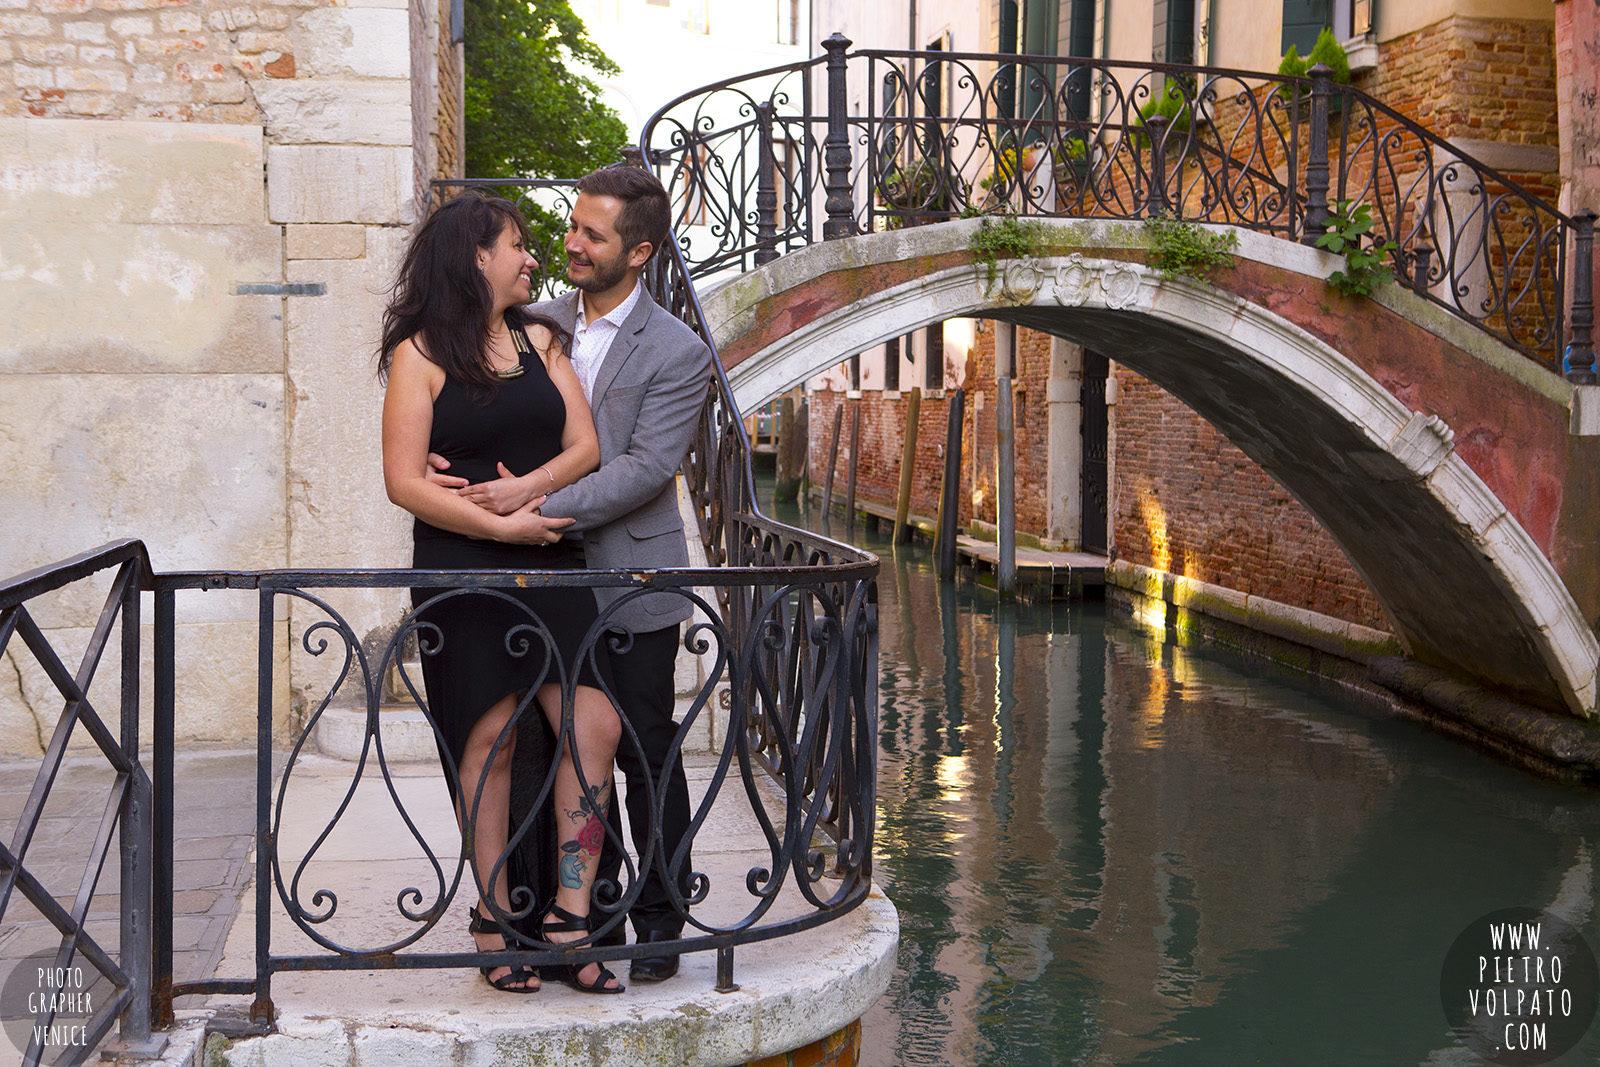 photographer-venice-photoshoot-couple-romantic-vacation-20160417_07